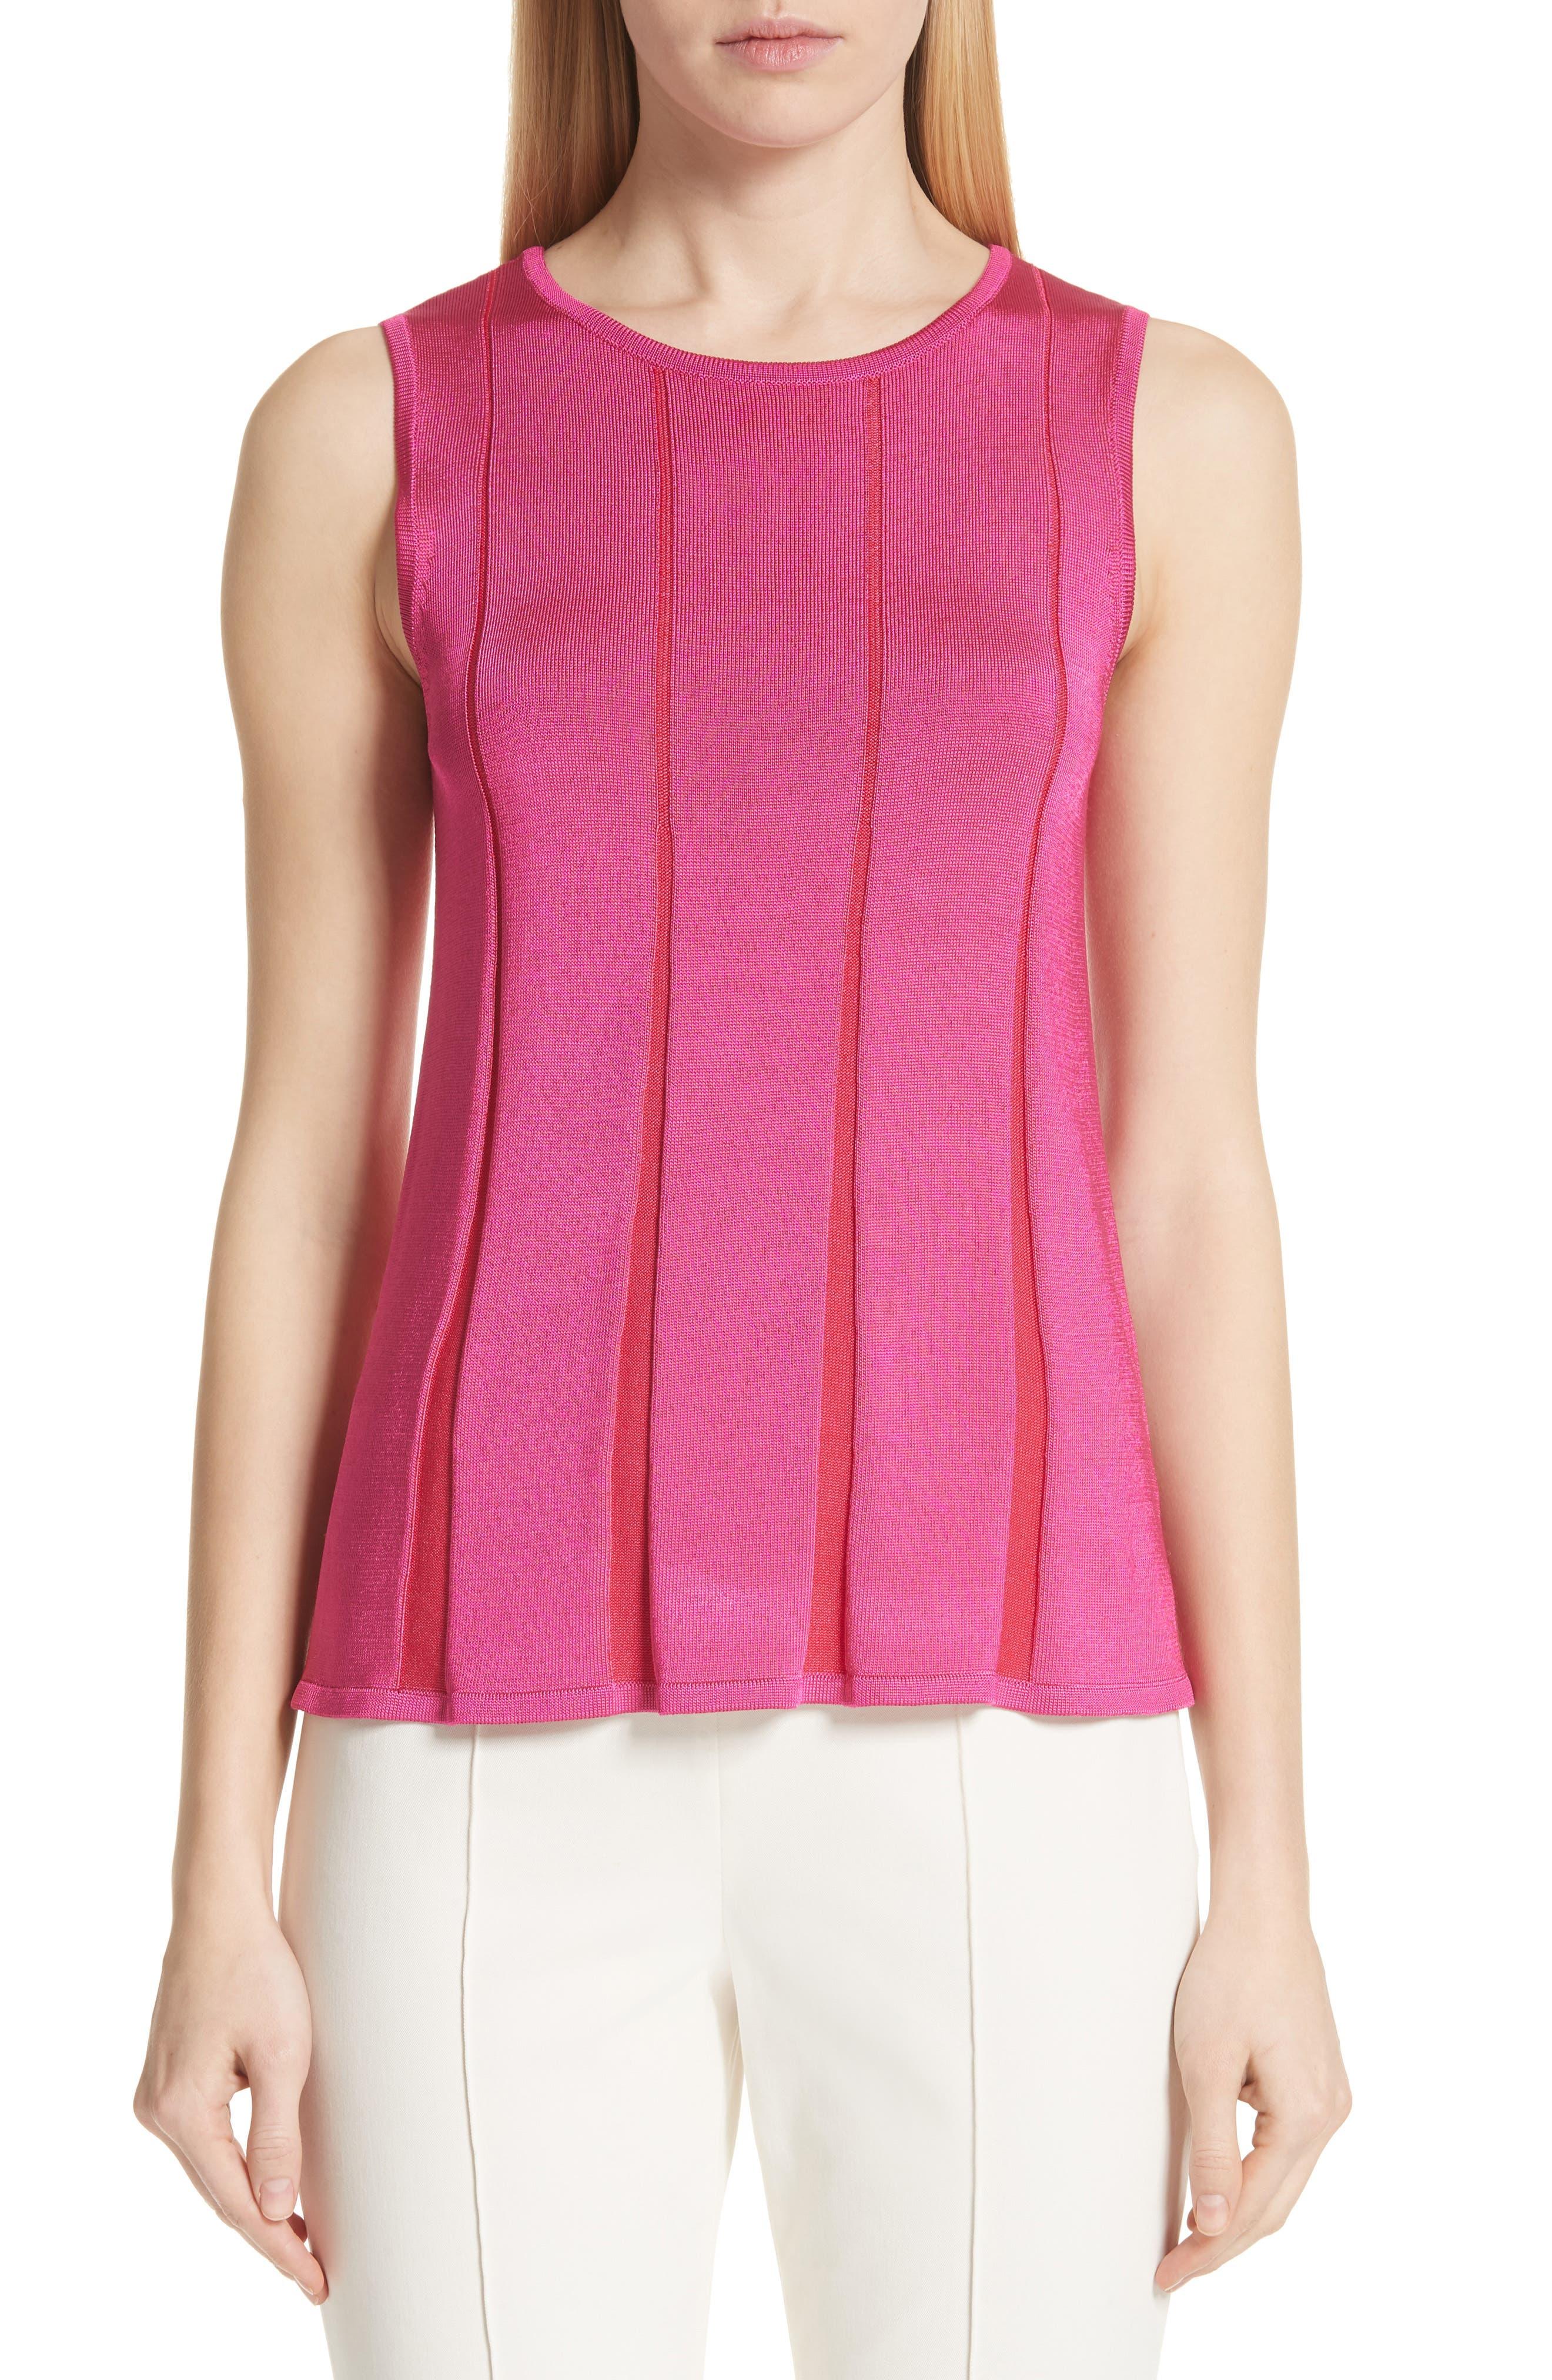 ST. JOHN Plaited Fit & Flare Sleeveless Sweater in Fuchsia/ Lingonberry